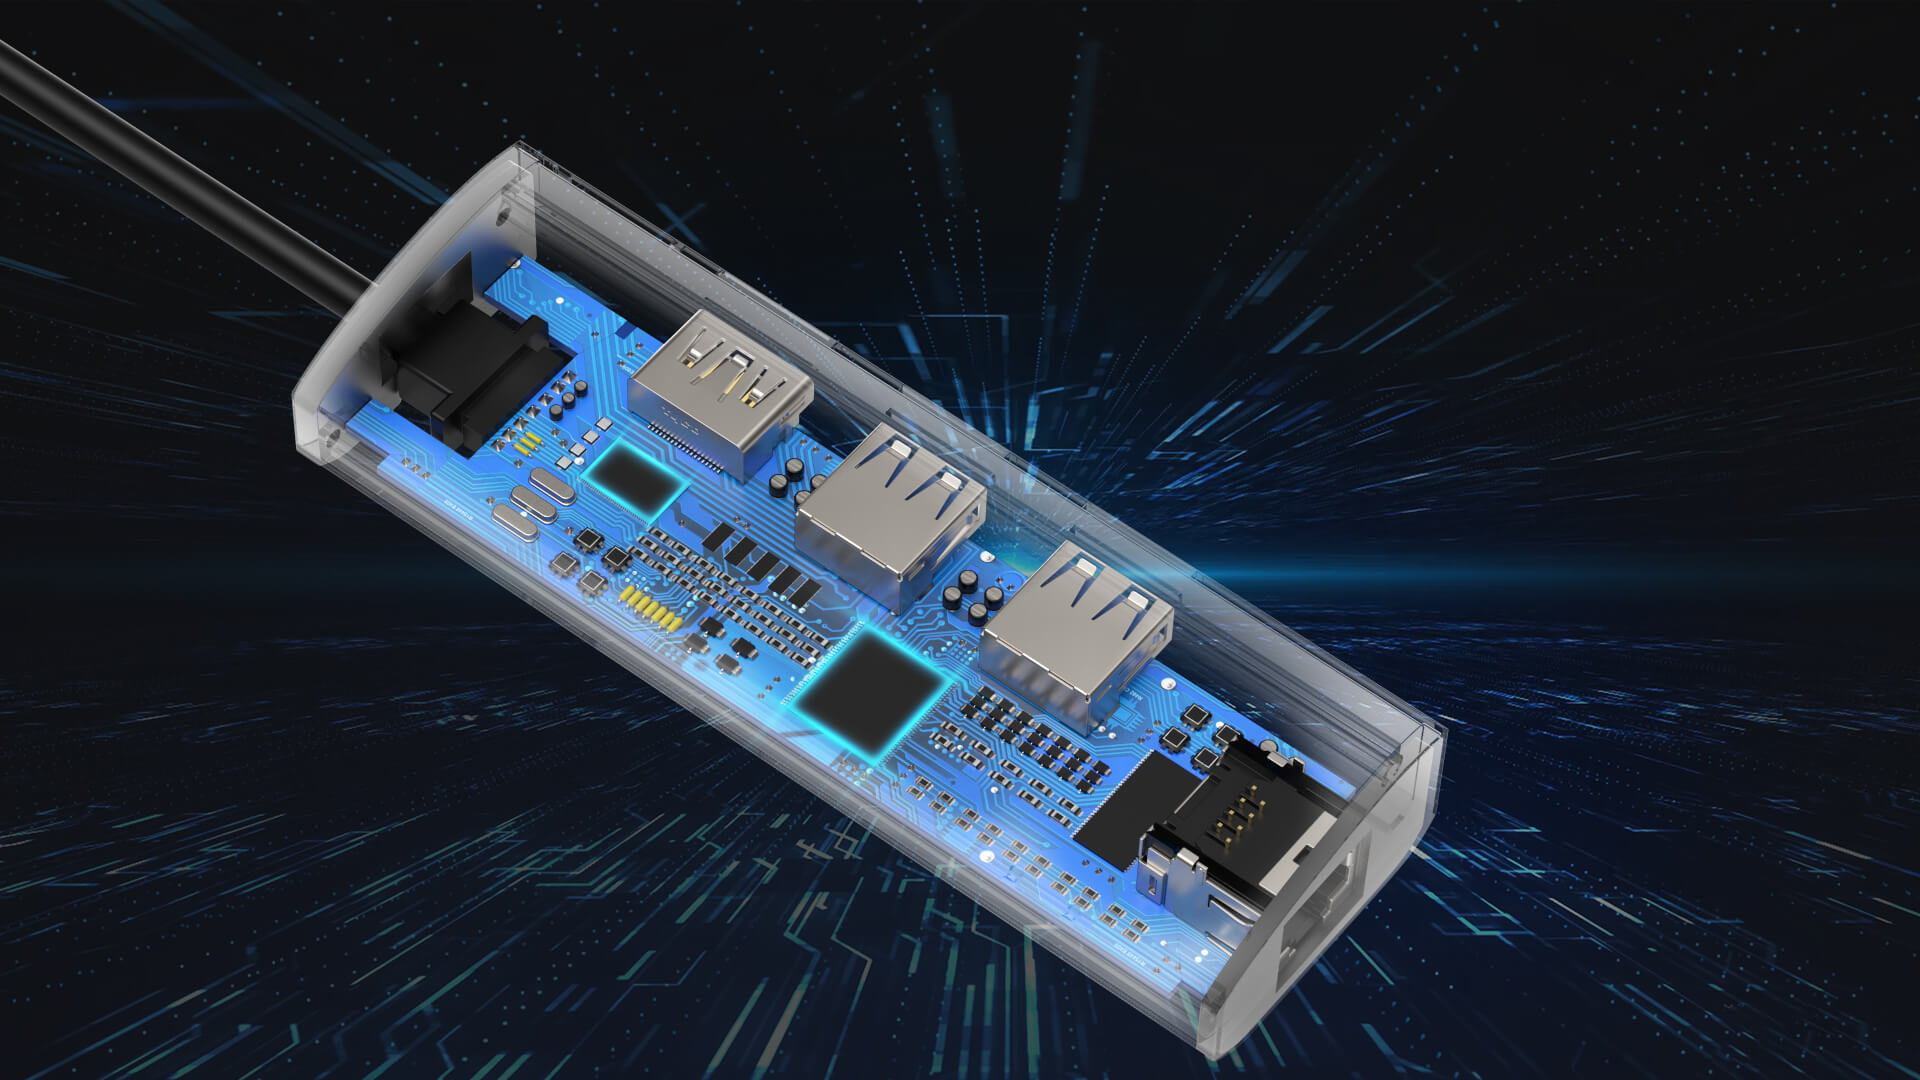 WAVLINK USB-C 3.1 TRAVELLING MINI DOCK WITH GIGABIT ETHERNET pc6 9